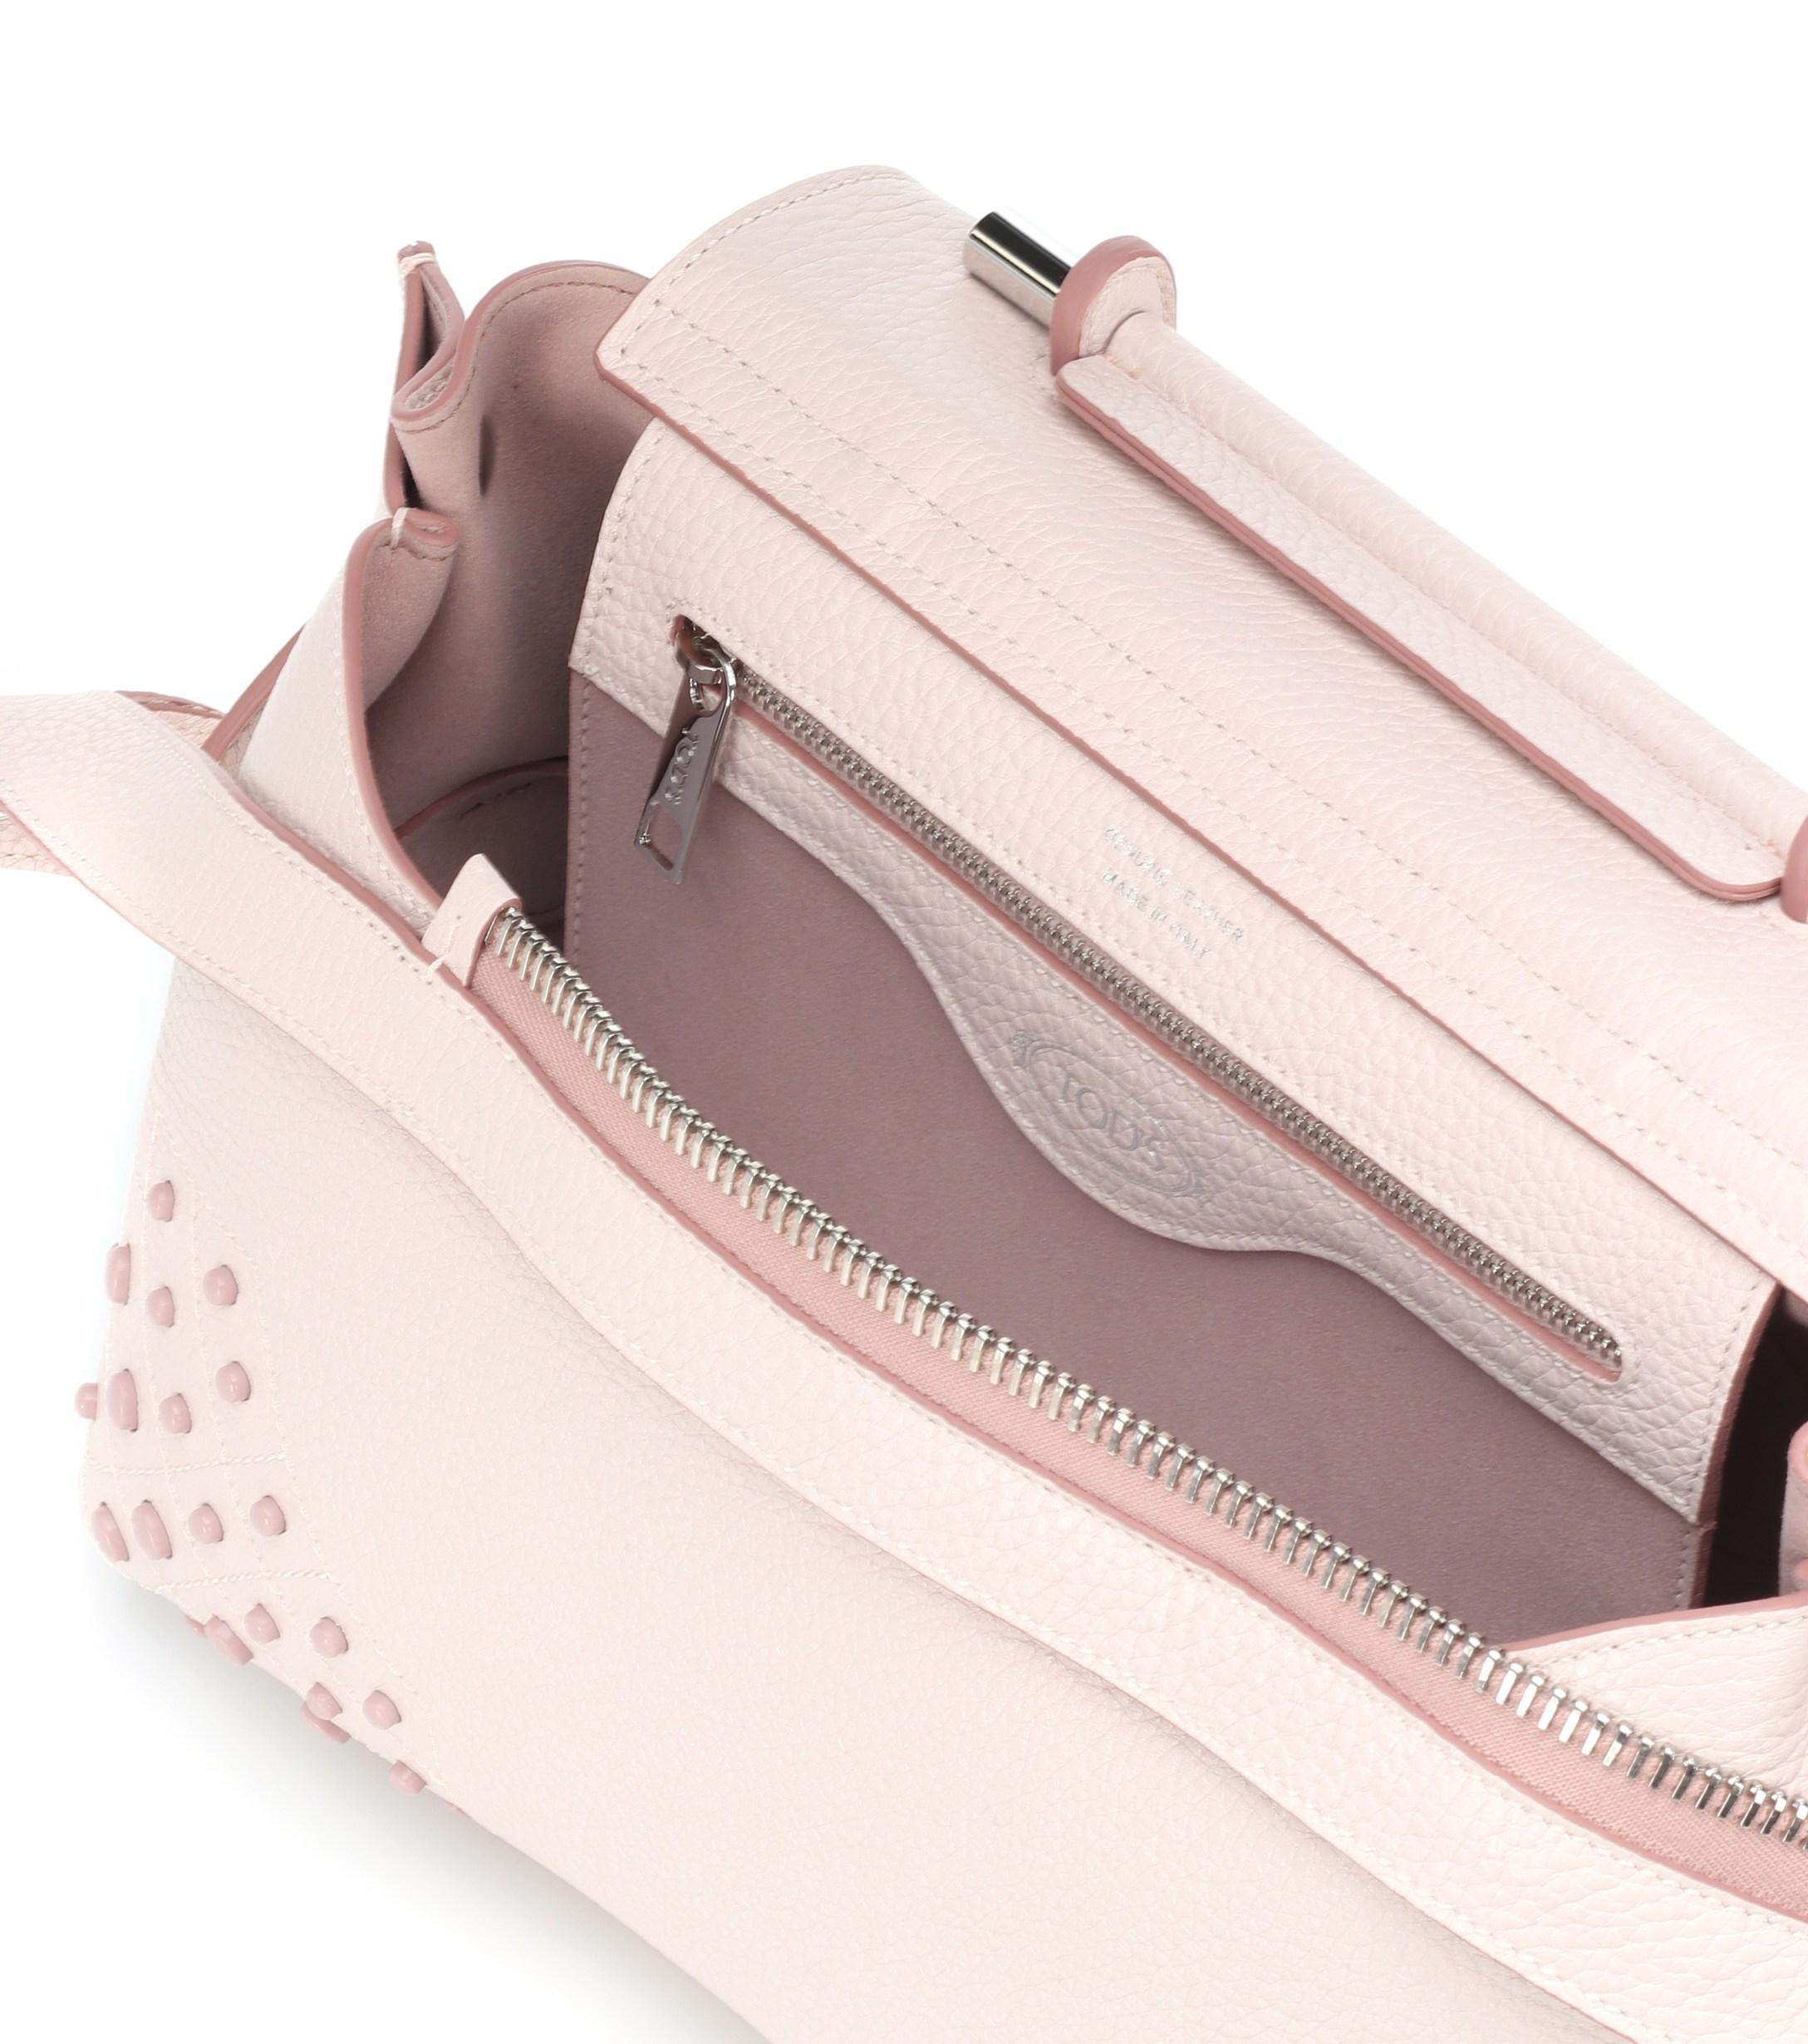 ce72e942e7b ... Wave Mini Leather Shoulder Bag - Lyst. View fullscreen